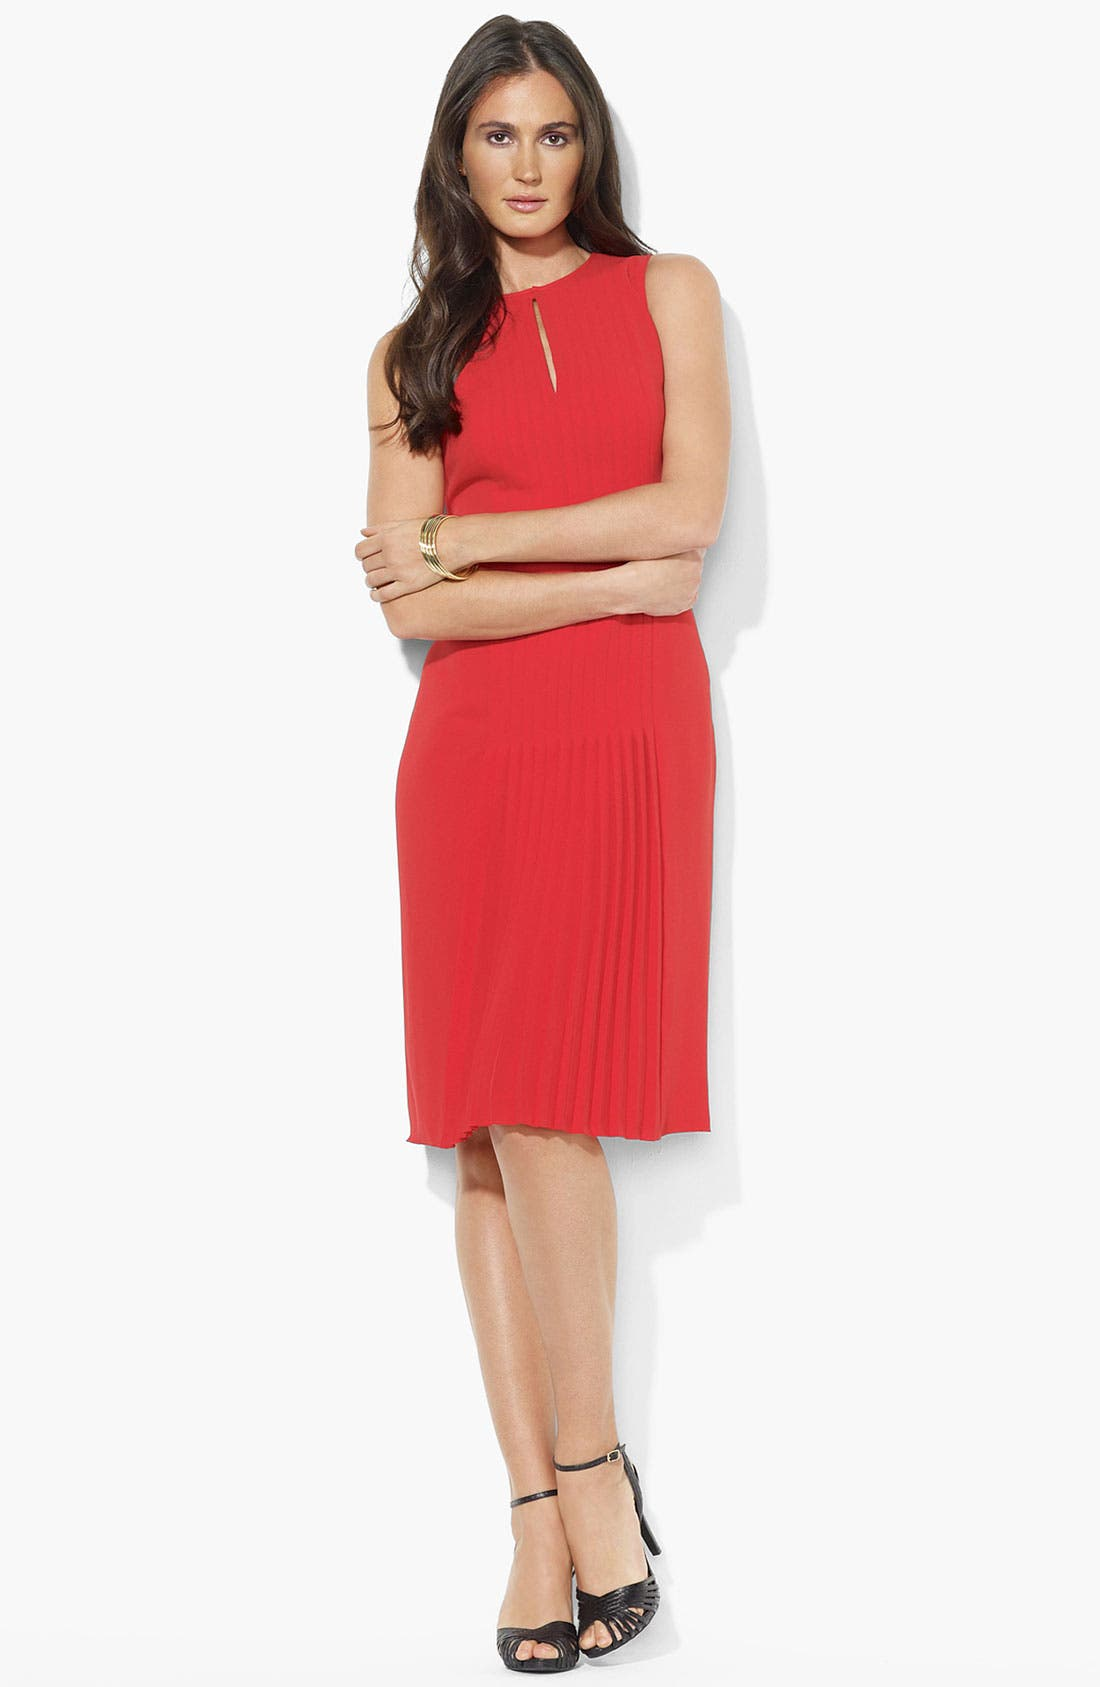 Alternate Image 1 Selected - Lauren Ralph Lauren Pleated Sleeveless Dress (Petite)